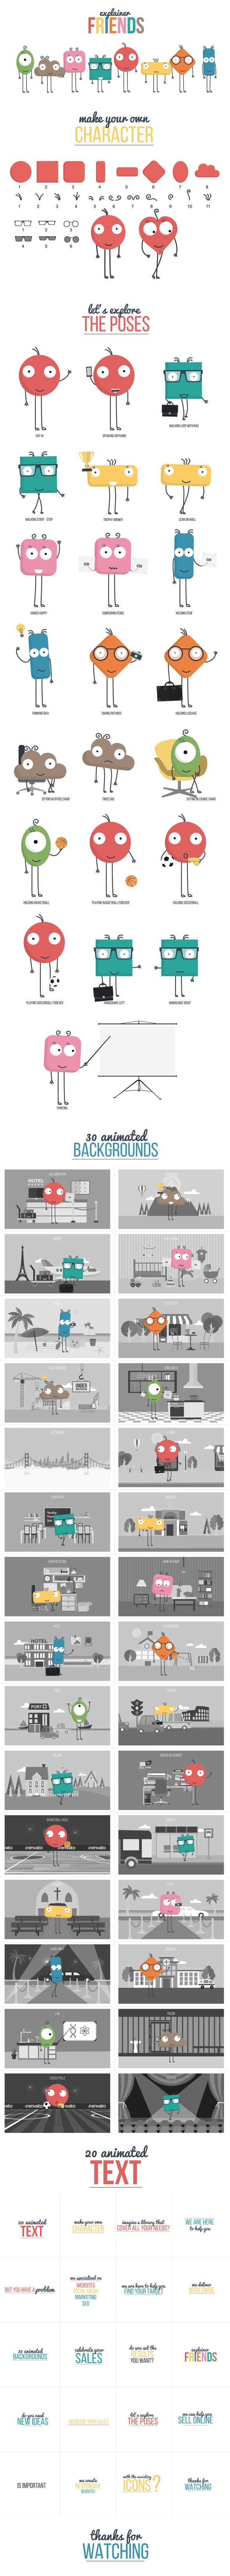 PR预设-动态卡通可爱小人解说场景图标MG动画